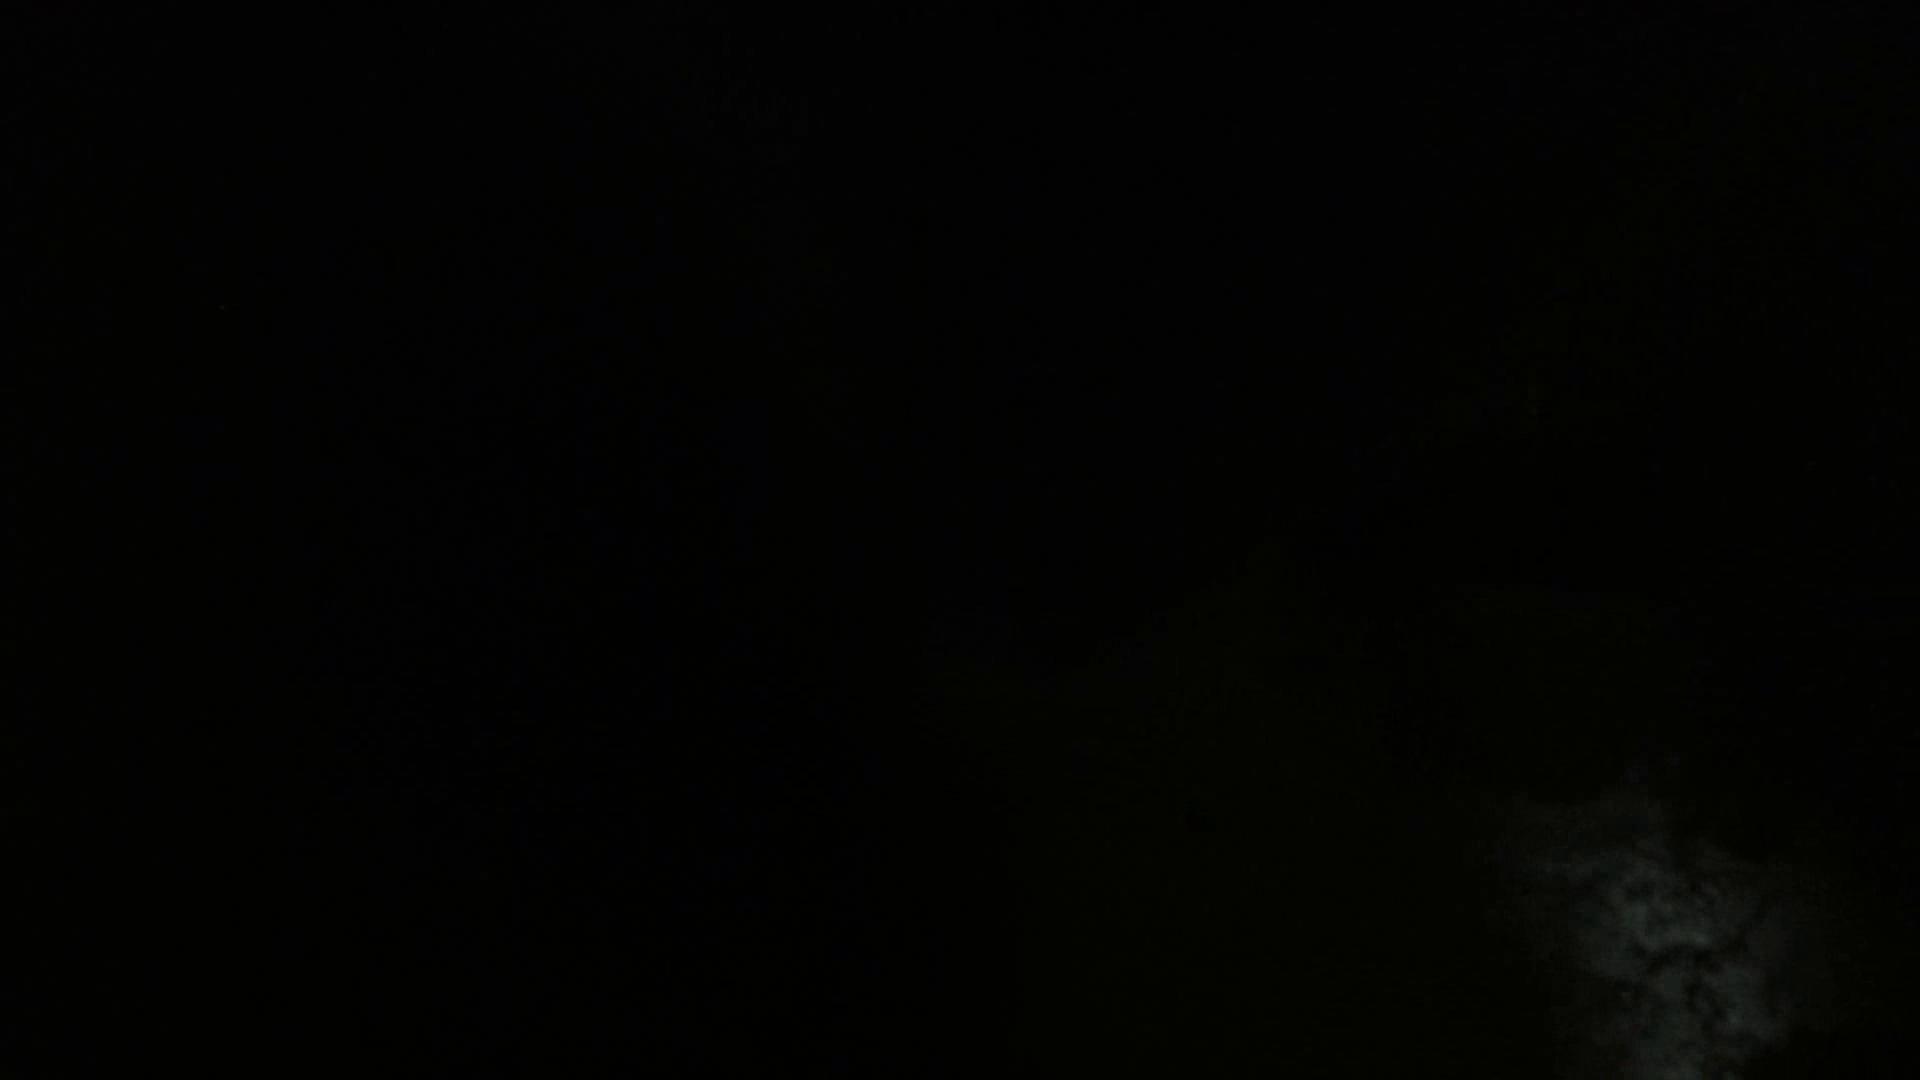 SPYさん初投稿!マンション覗き!5000K!ハイビジョン撮影VOL.01(現役野球部大学生編) 完全無修正版 ゲイエロ画像 95枚 67